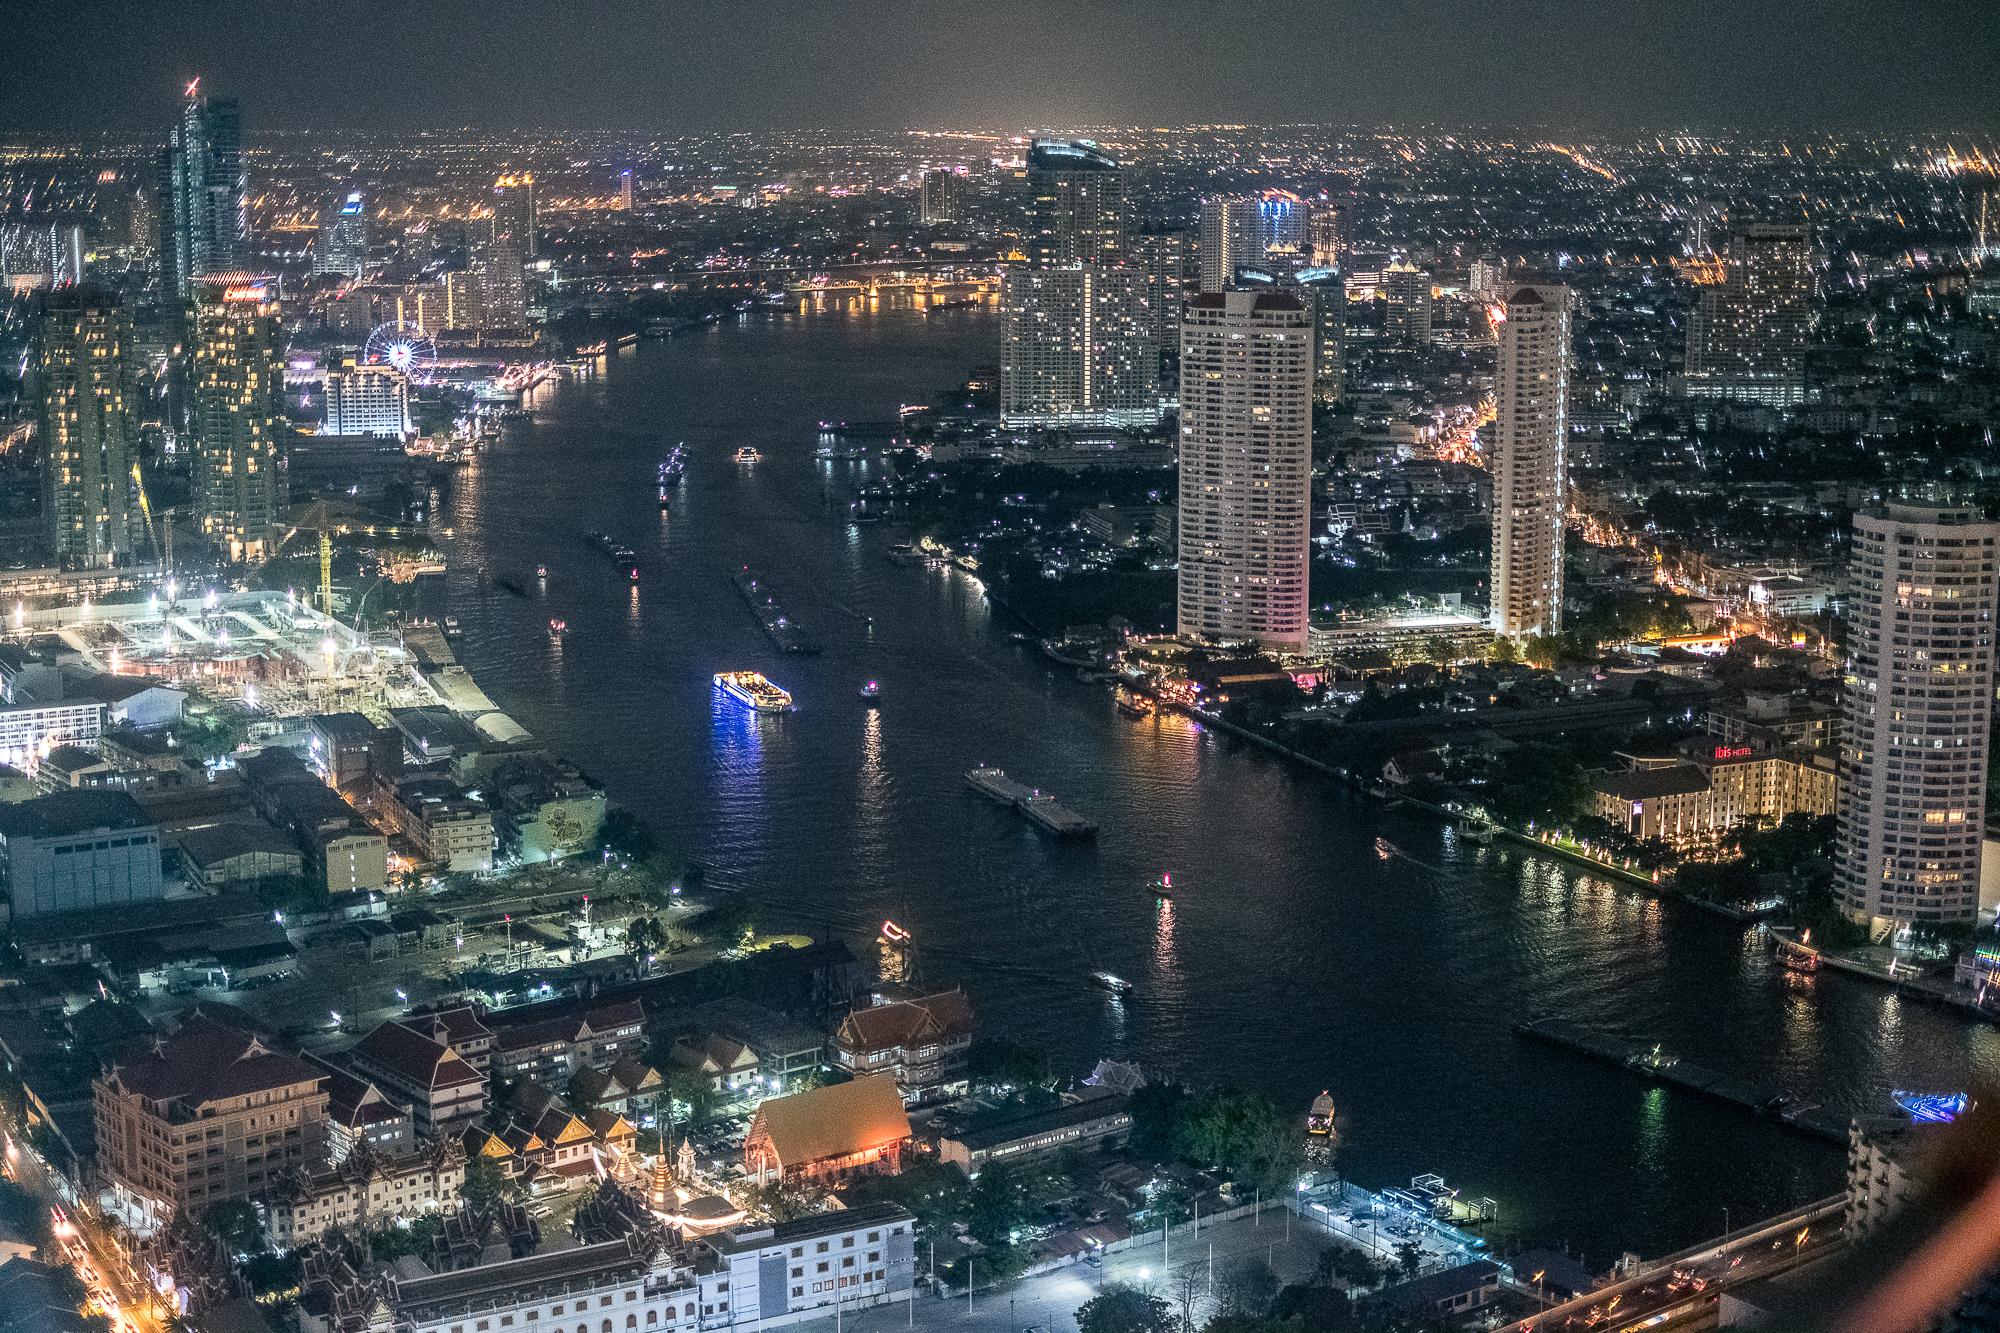 THAILAND_Honeymoon_TheOutsiderBlog_DSCF0045.JPG